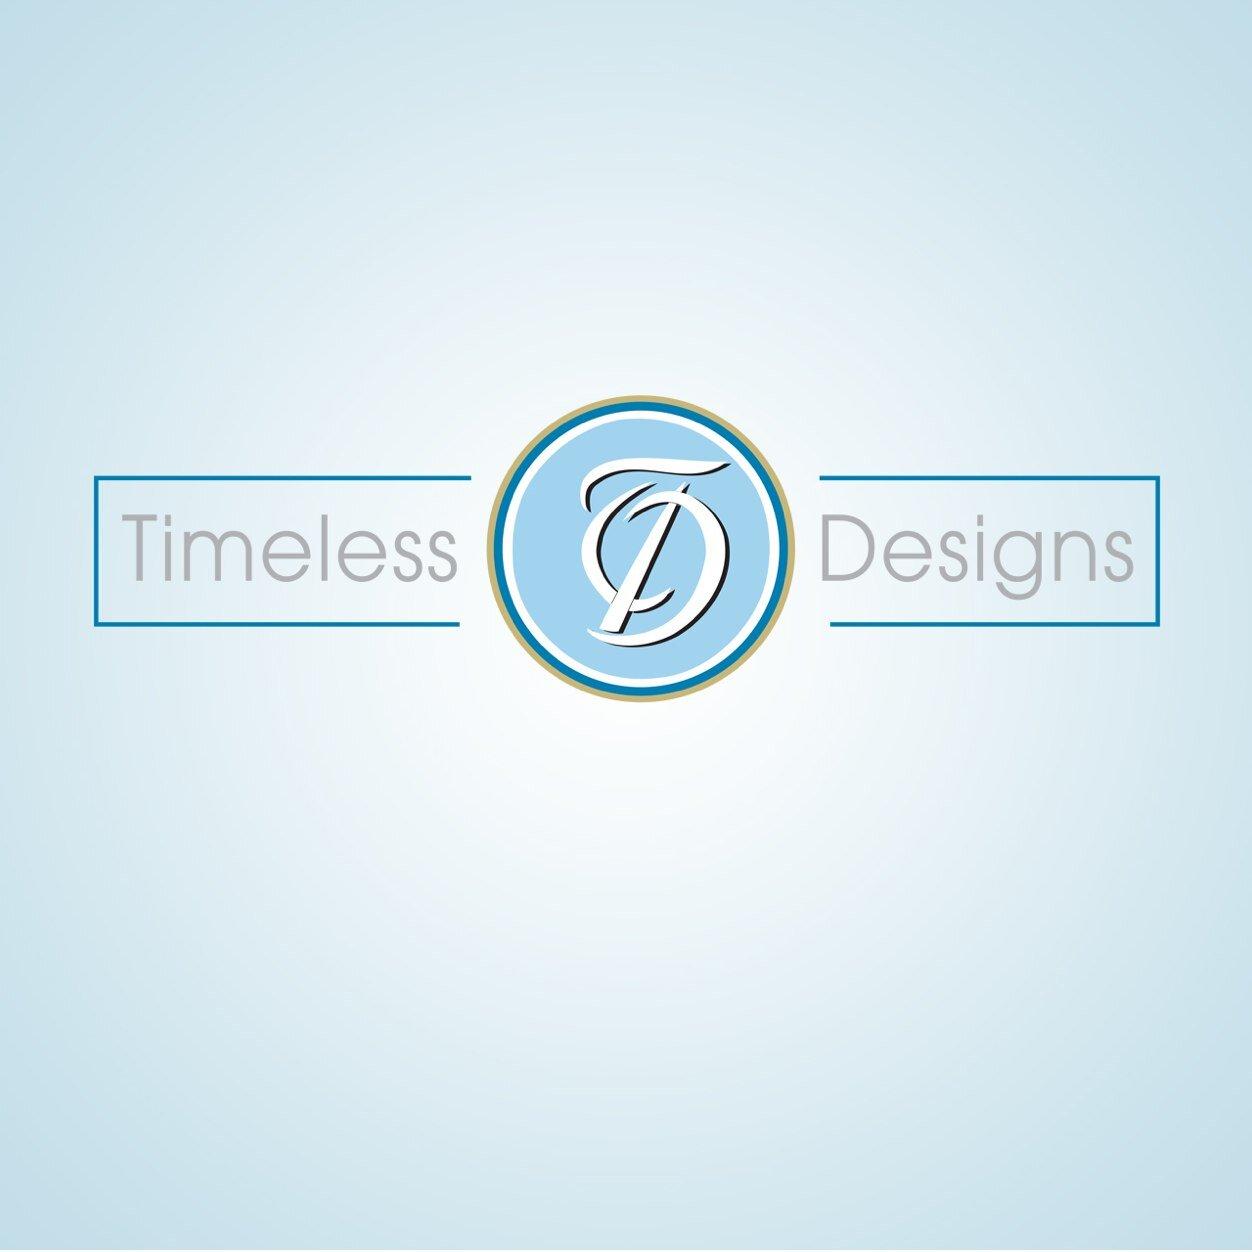 timeless designs